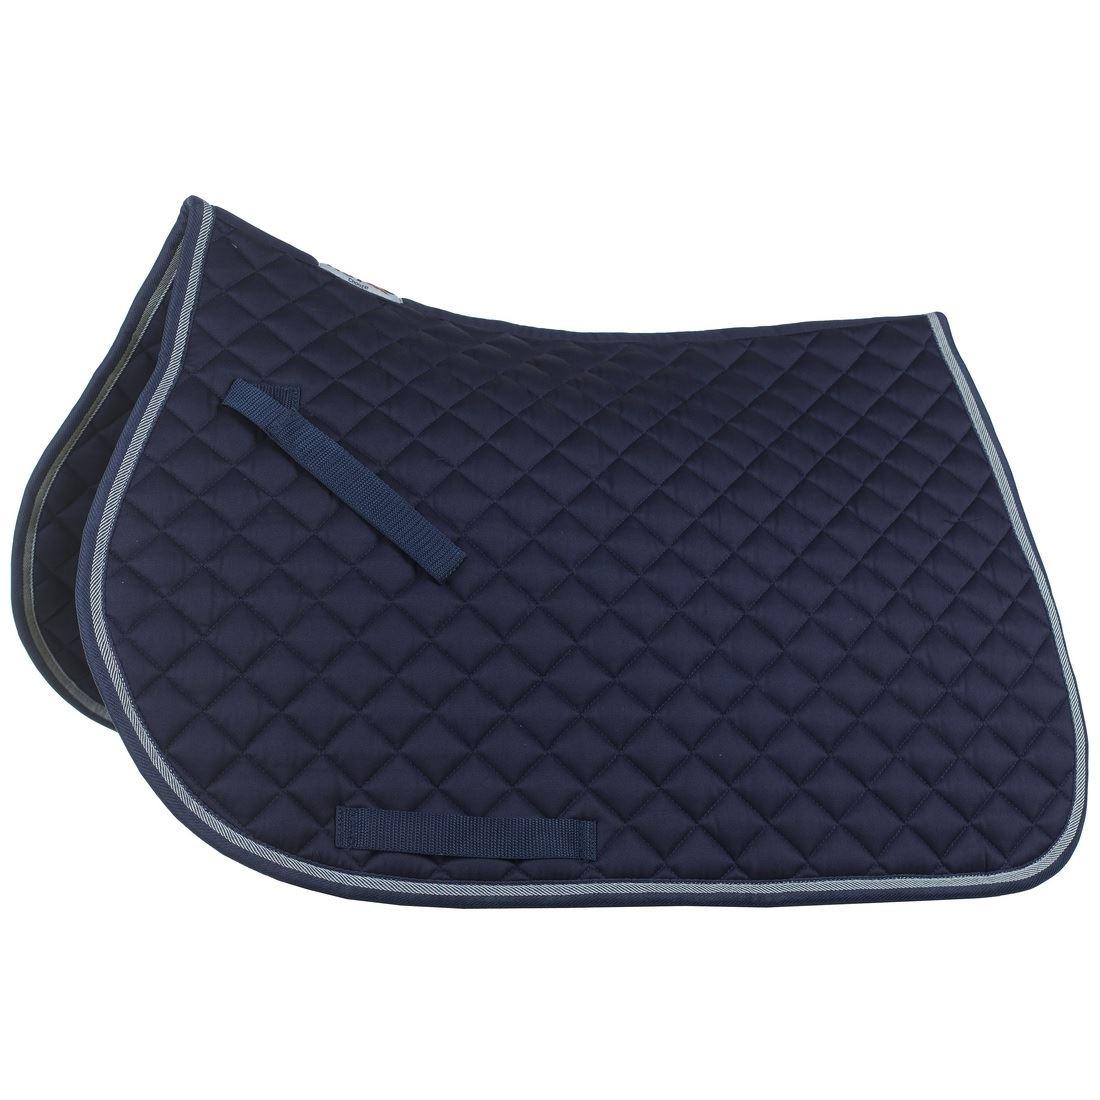 Chooze All-purpose saddle pad navy